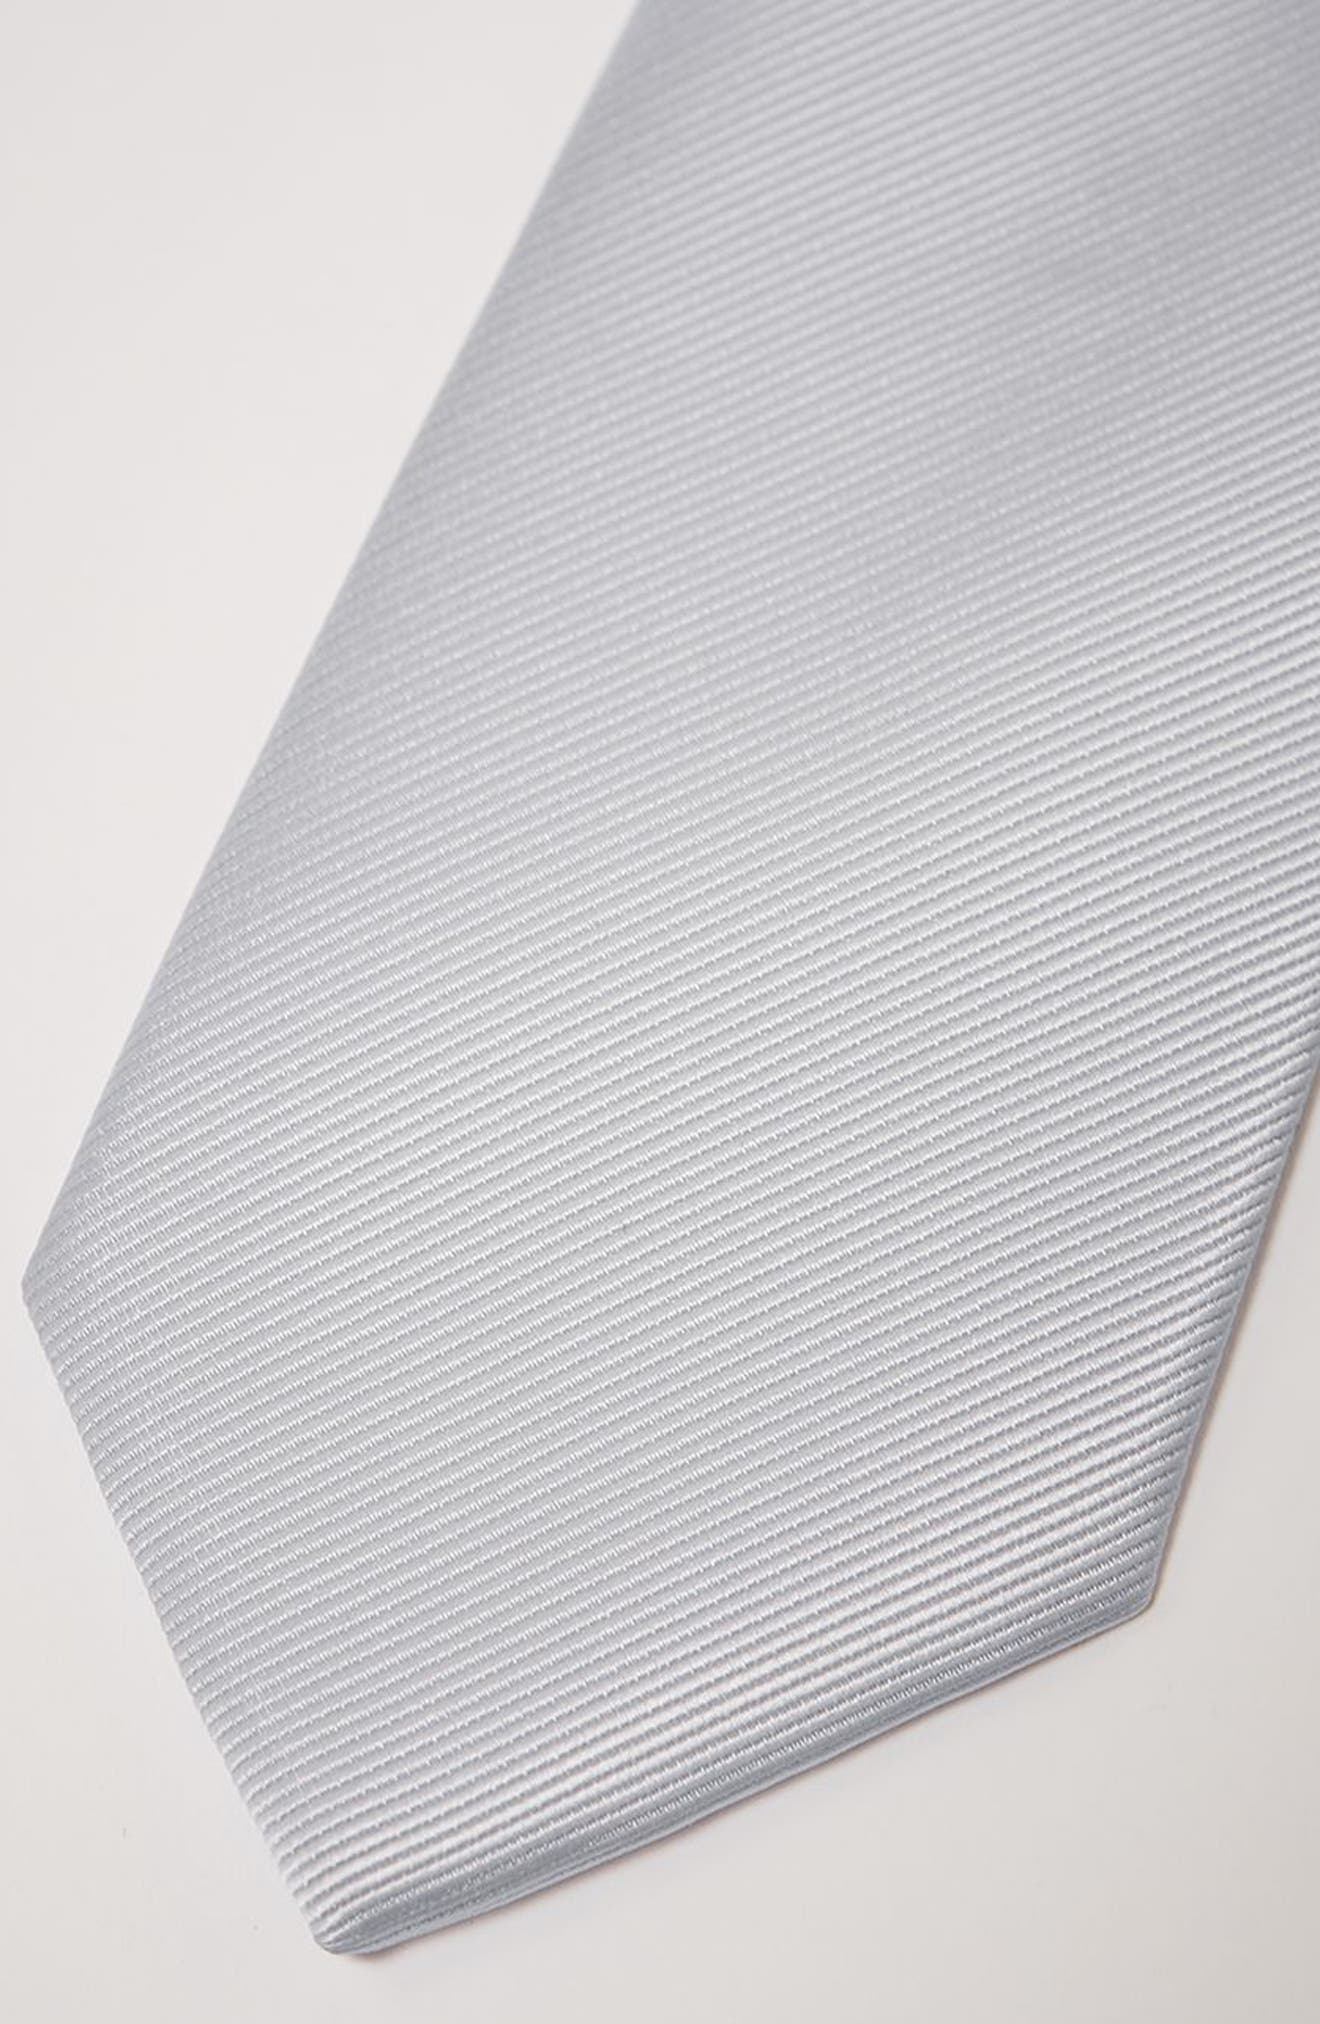 Woven Tie,                             Alternate thumbnail 2, color,                             050